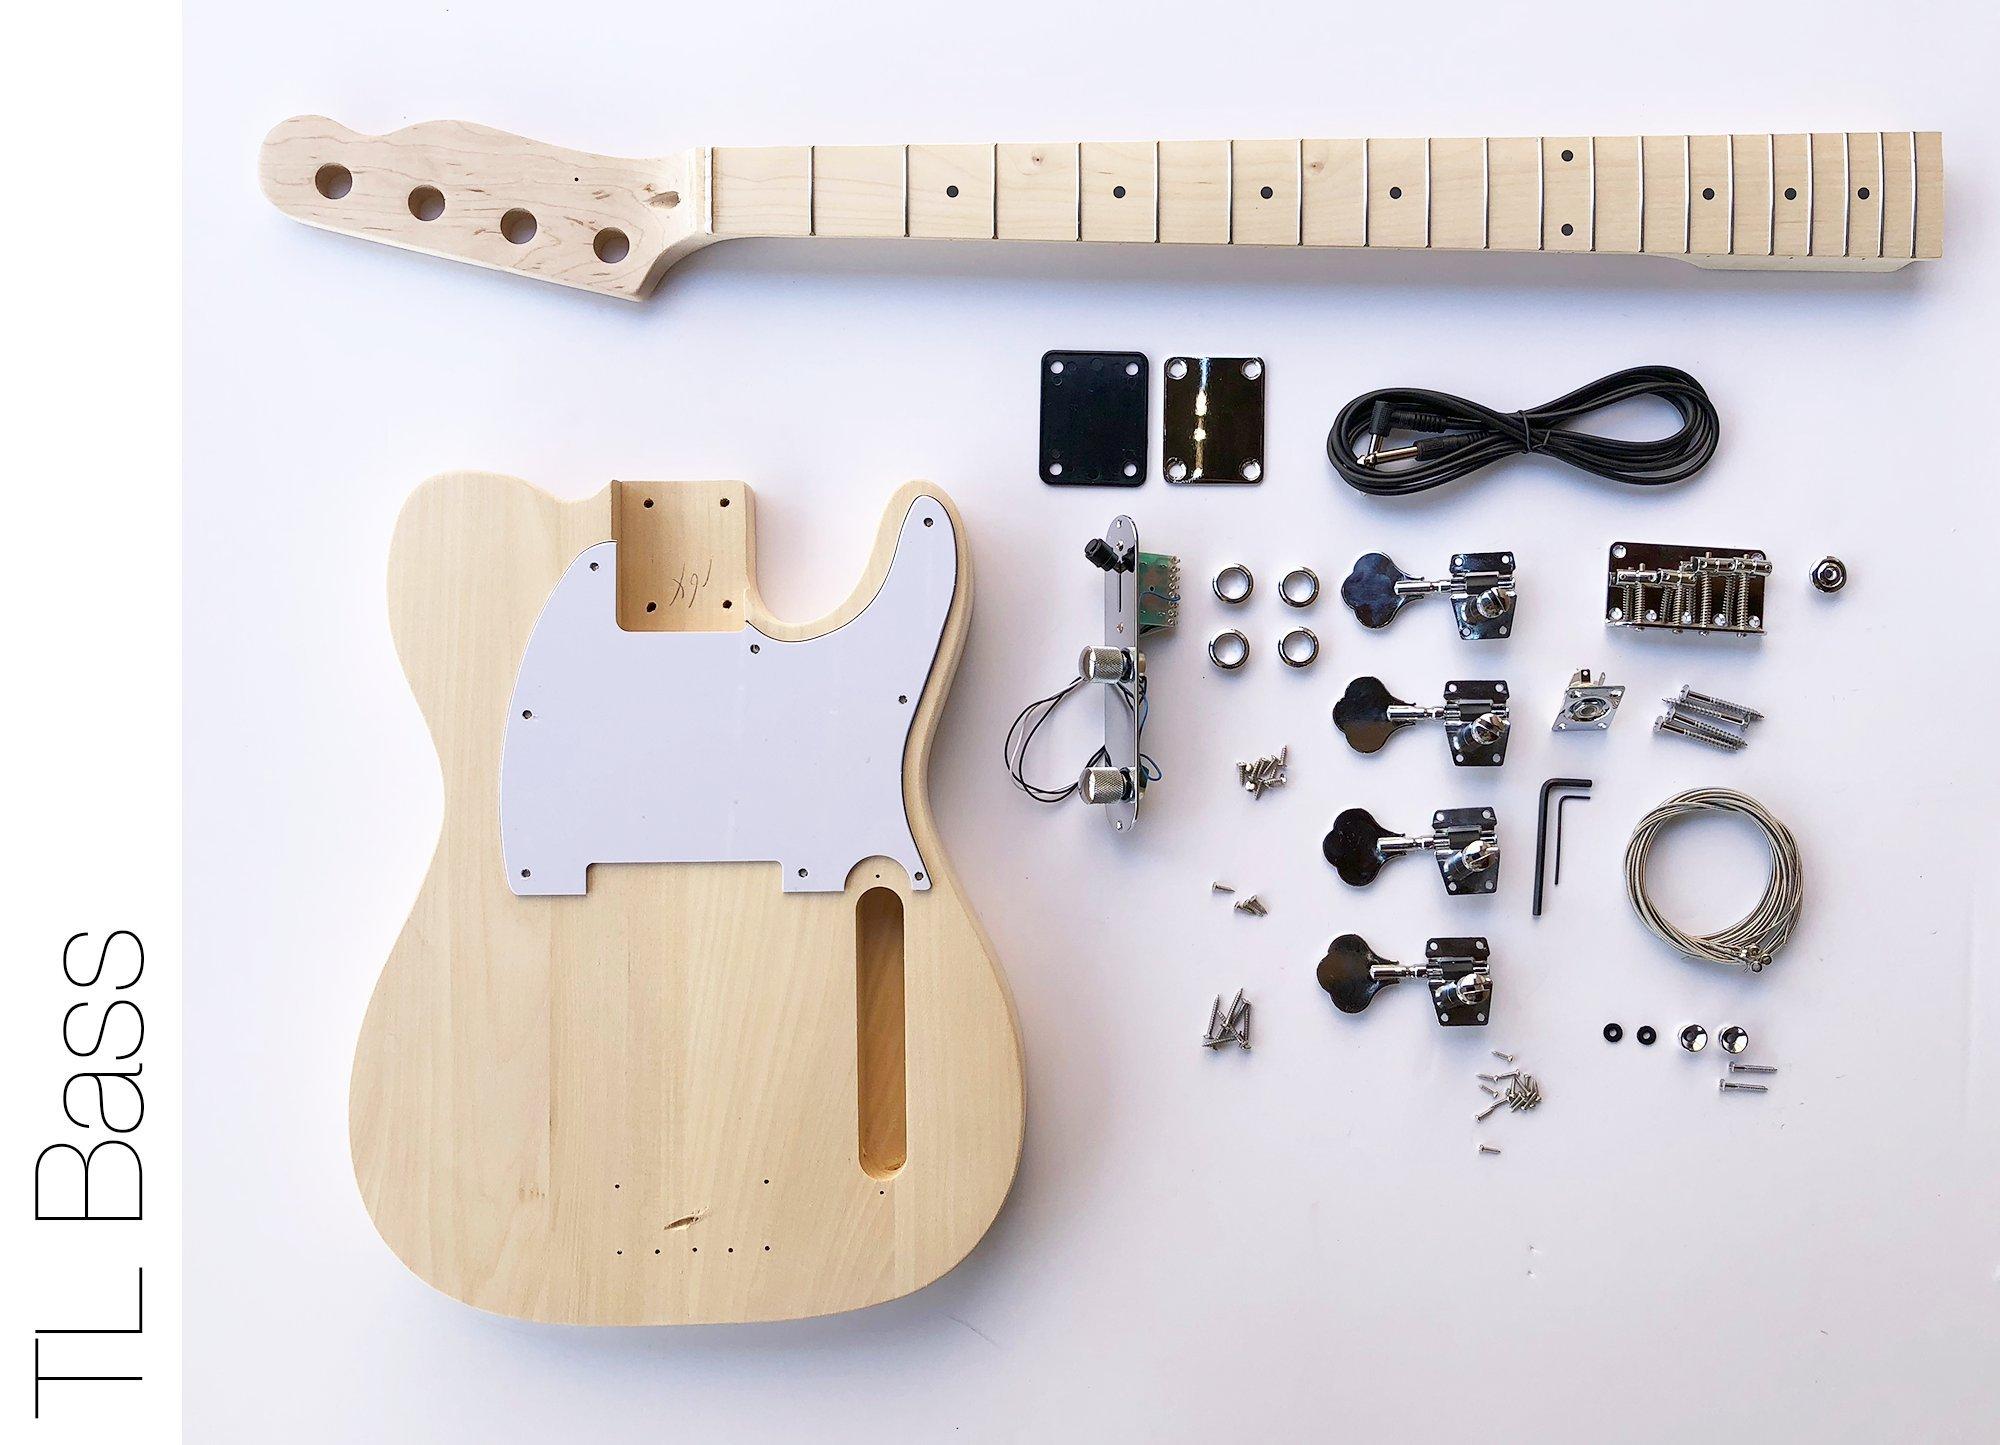 Cheap DIY Electric Bass Guitar Kit - TL Bass Advanced Guitar Kit Black Friday & Cyber Monday 2019